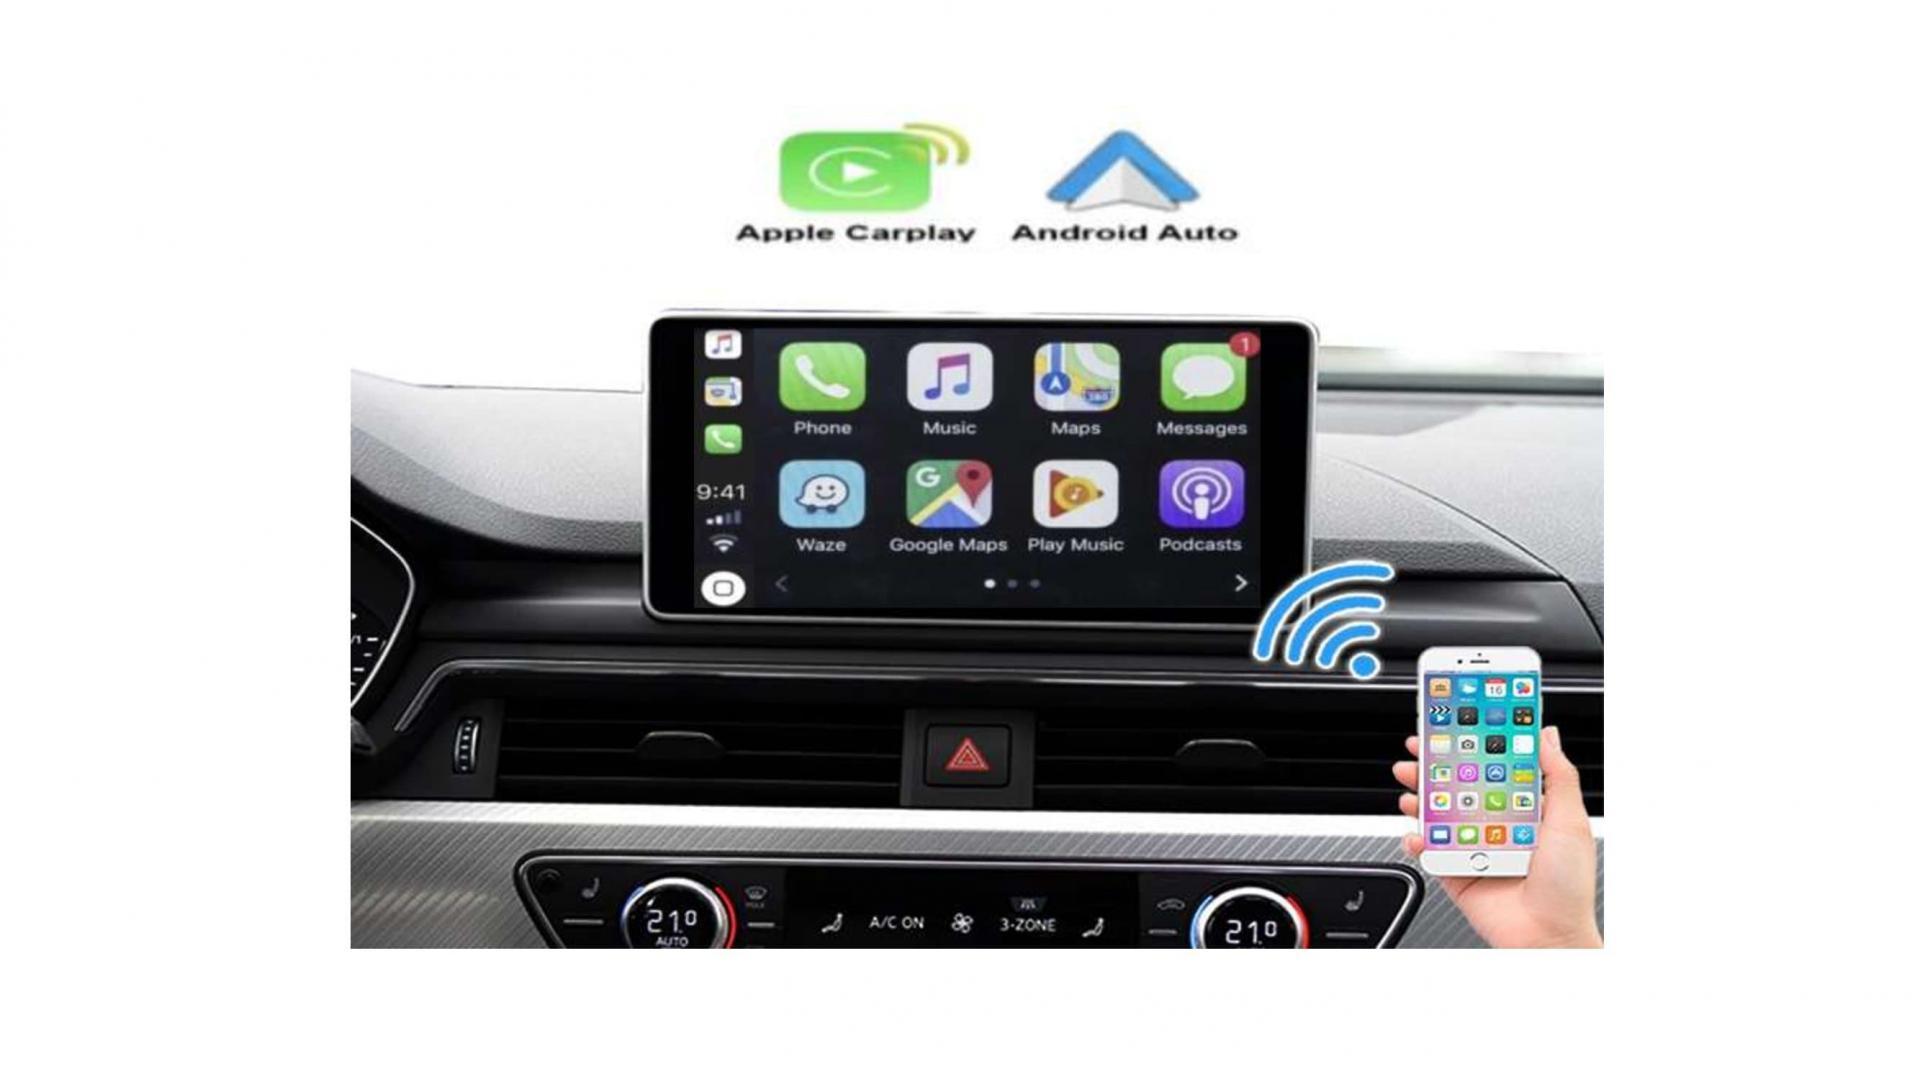 Ford ranger mondeo kuga c max explorer f150 transit focus connect tourneo carplay android auto gps autoradio 2010 2011 2012 2013 2014 2015 2016 2017 2018 2019 e84 x5 x6 serie 1 ser